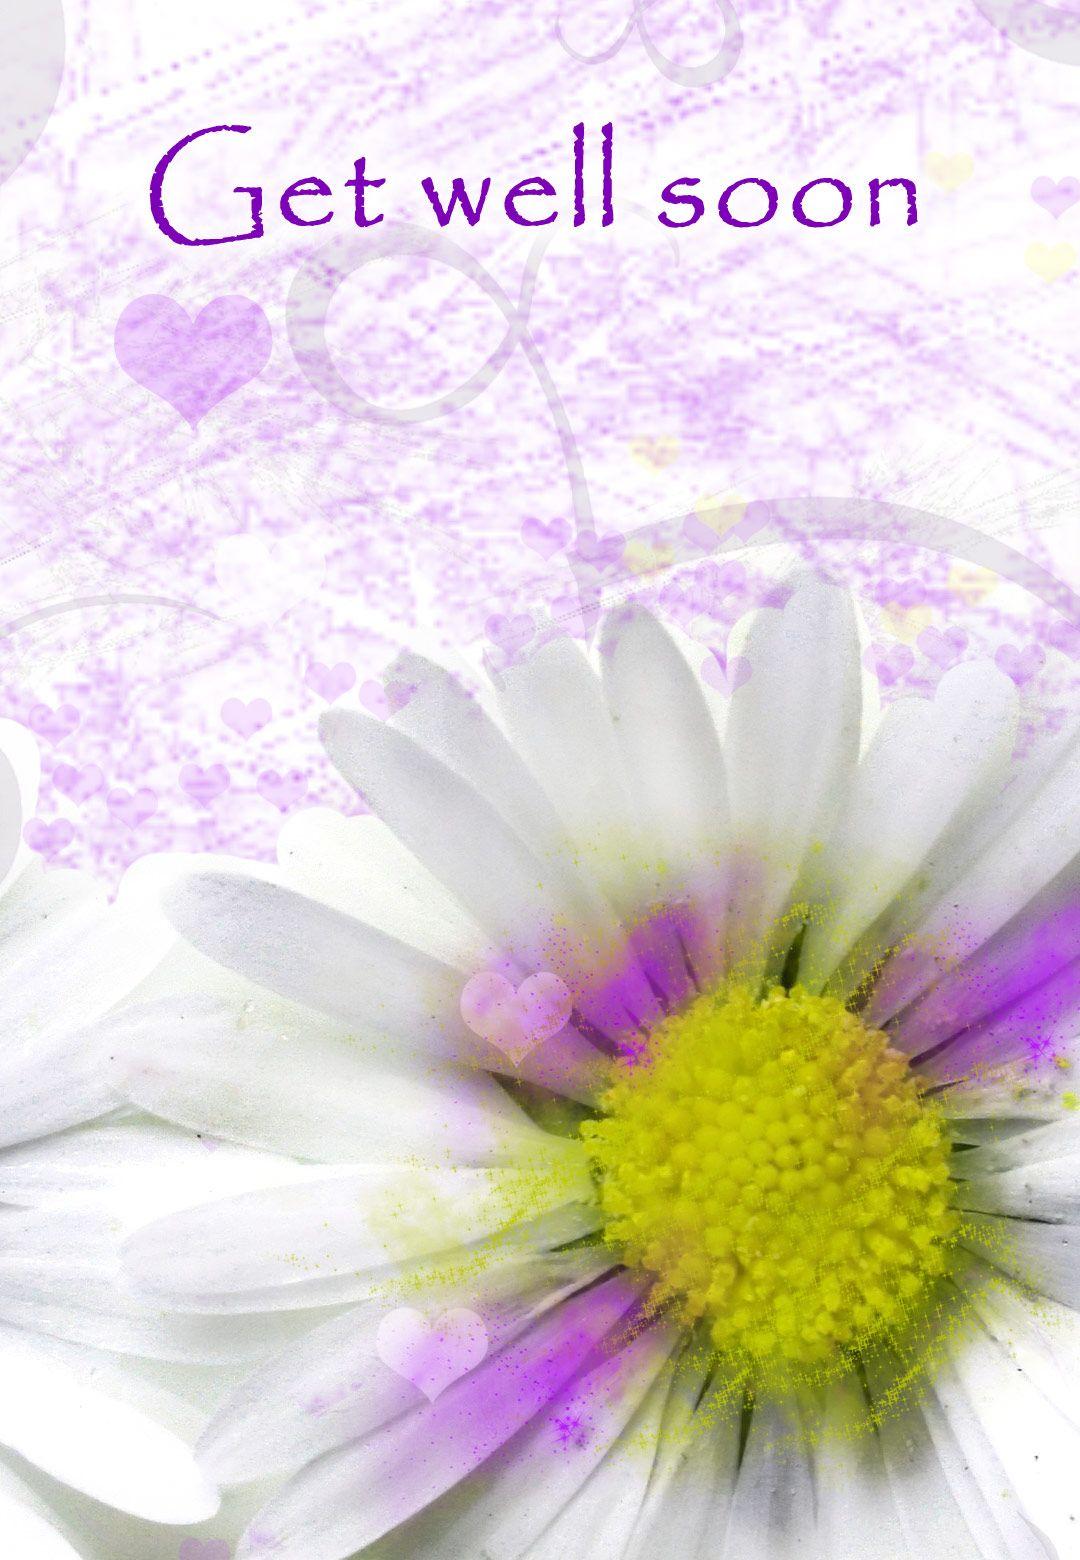 Free Printable Get Well Soon Flower Greeting Card Greetingisland